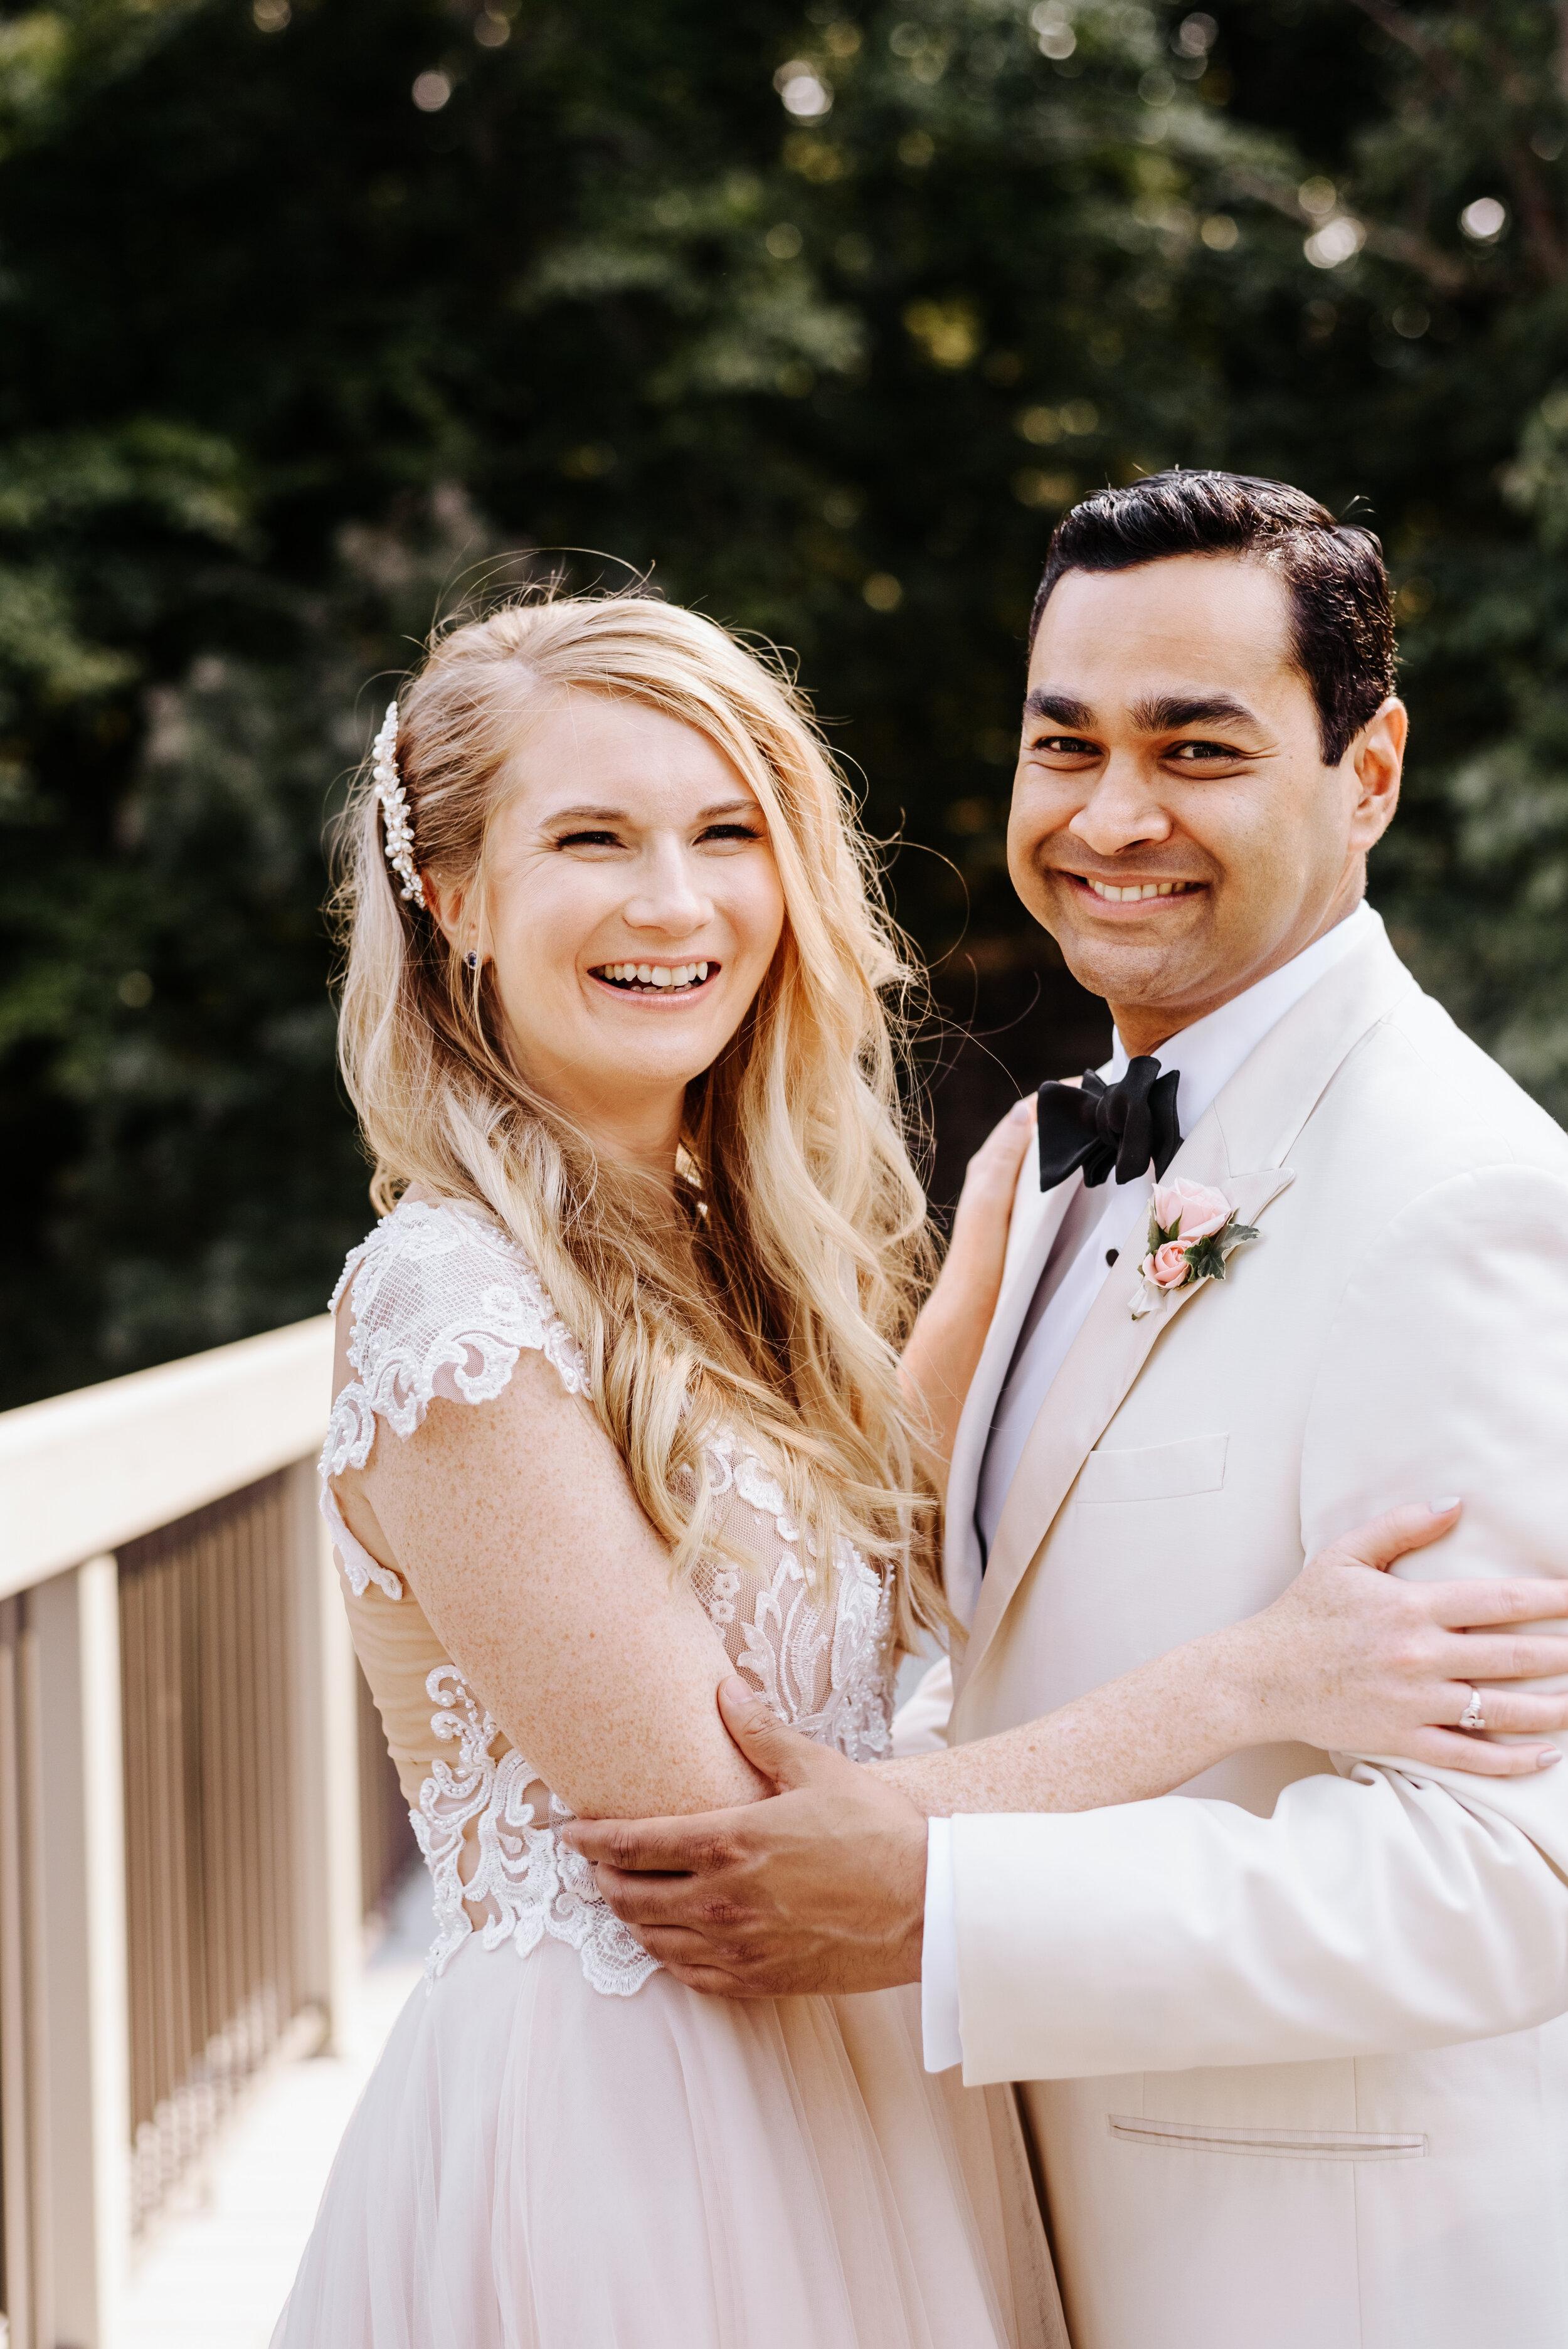 Cassie-Mrunal-Wedding-Quirk-Hotel-John-Marshall-Ballrooms-Richmond-Virginia-Photography-by-V-45.jpg